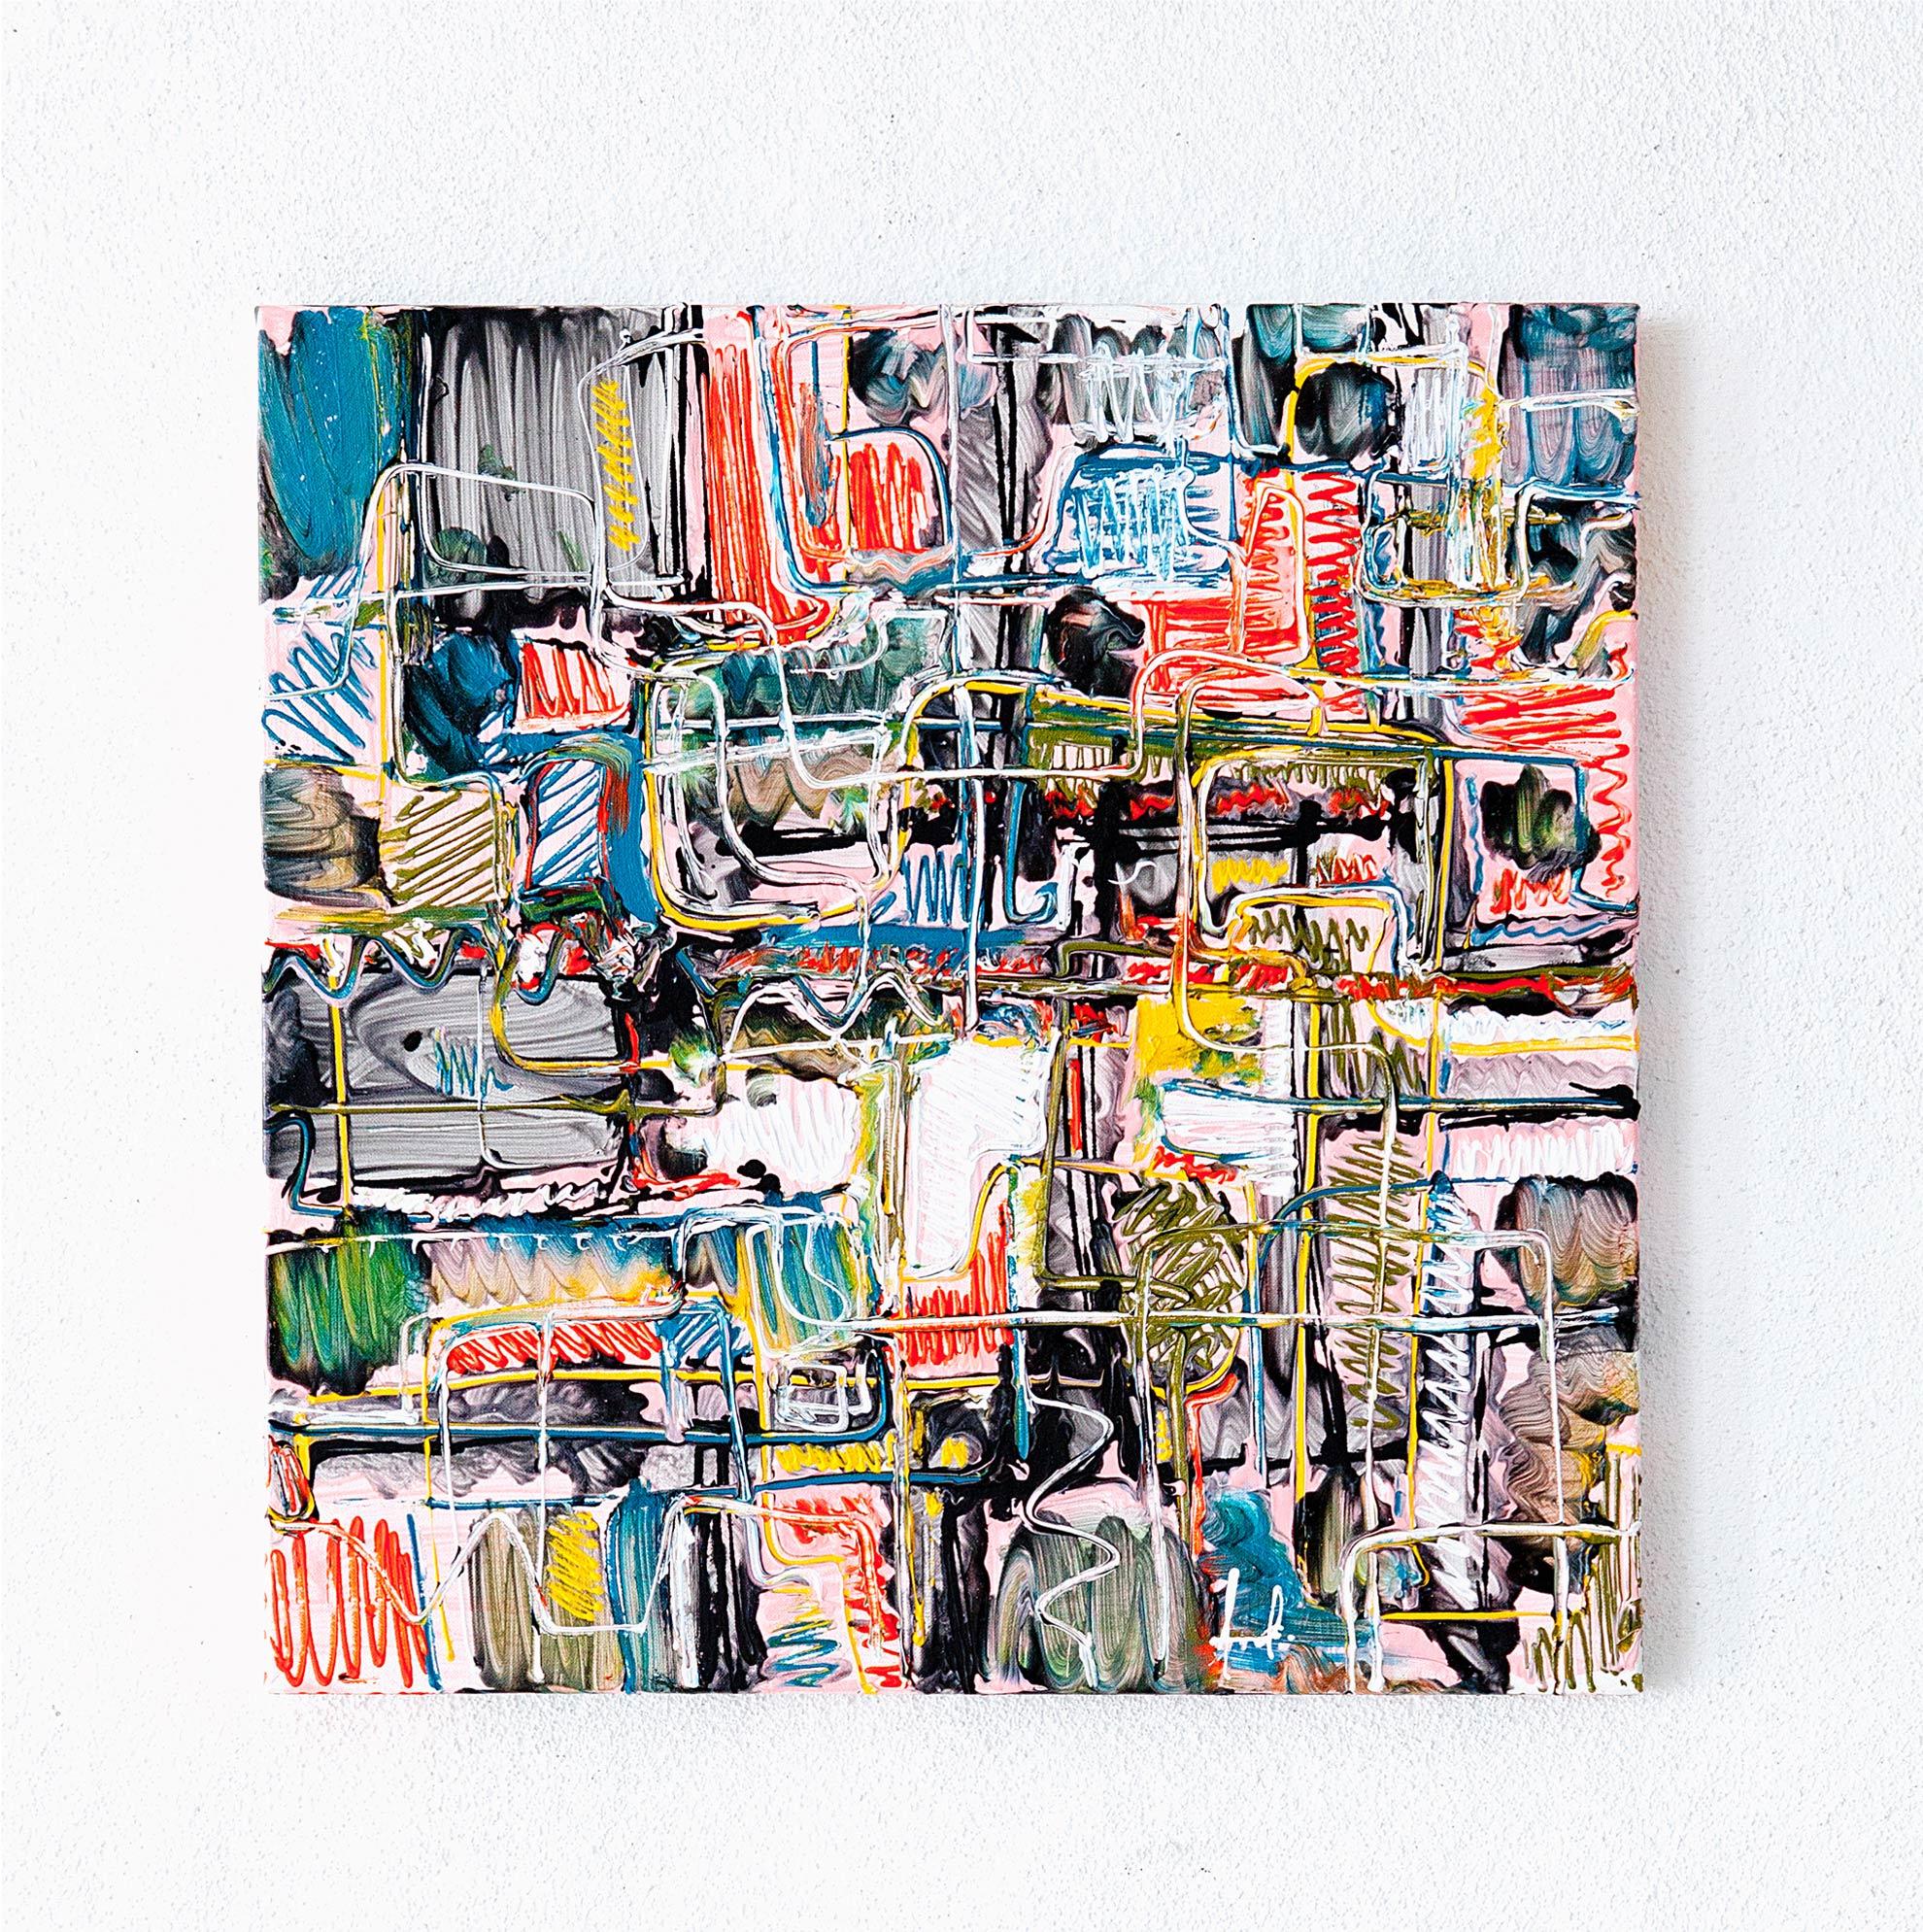 7-Adalierd_Barcelona_painting_2017_Art_contemporary_abstract_Rob_Adalierd_sale_THUMB.jpg